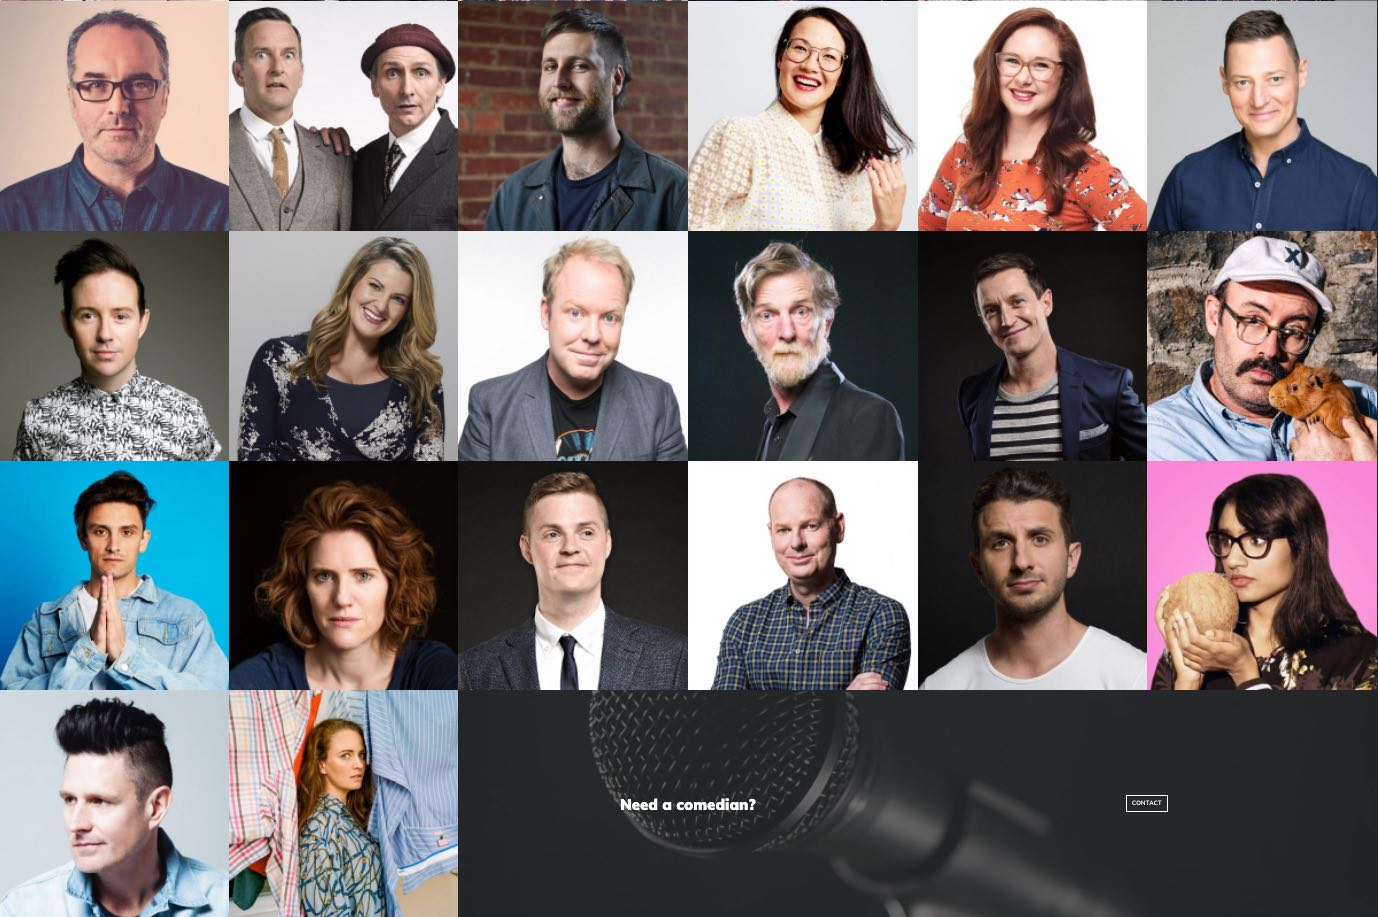 The artists from token artist